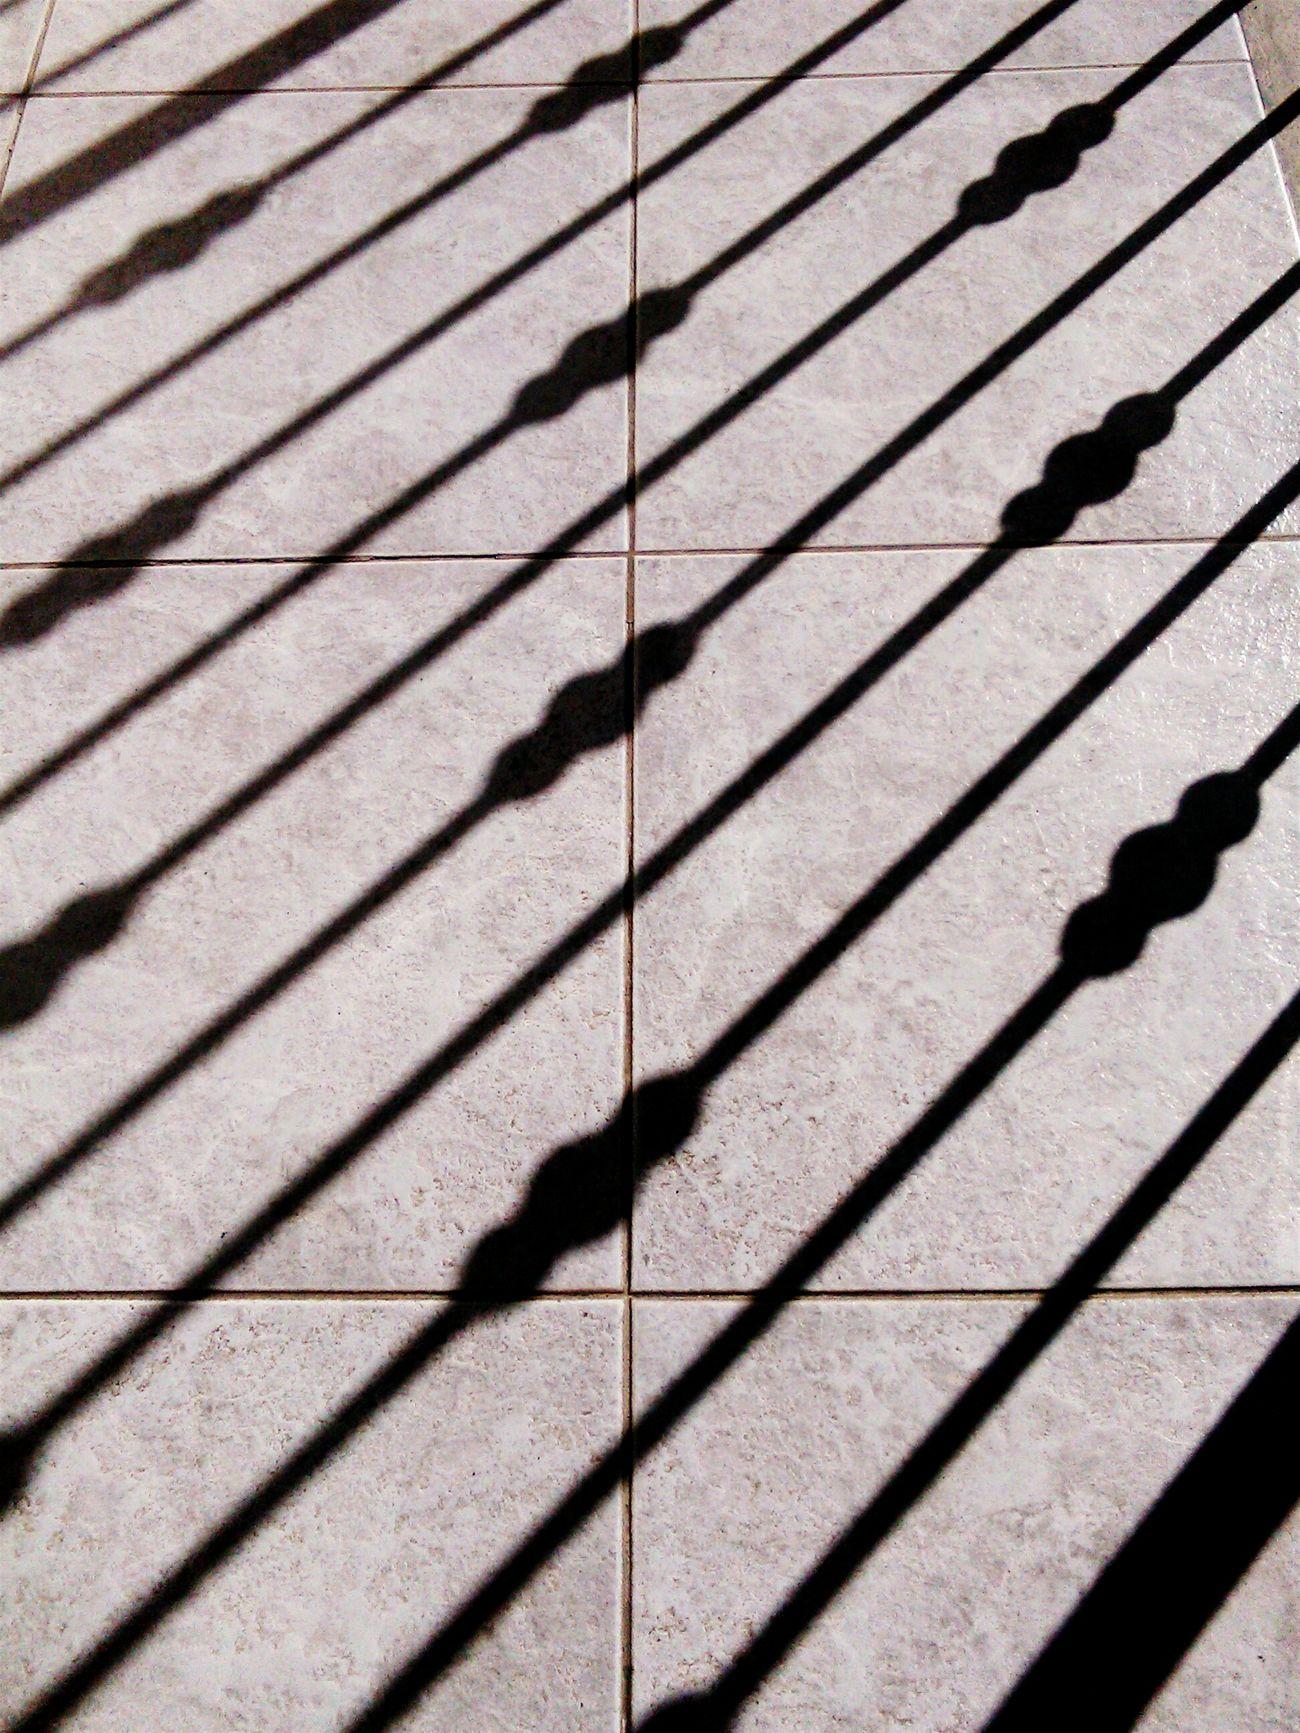 Precision Canon1100d Creative Light And ShadowUrban Photography Smart Simplicity